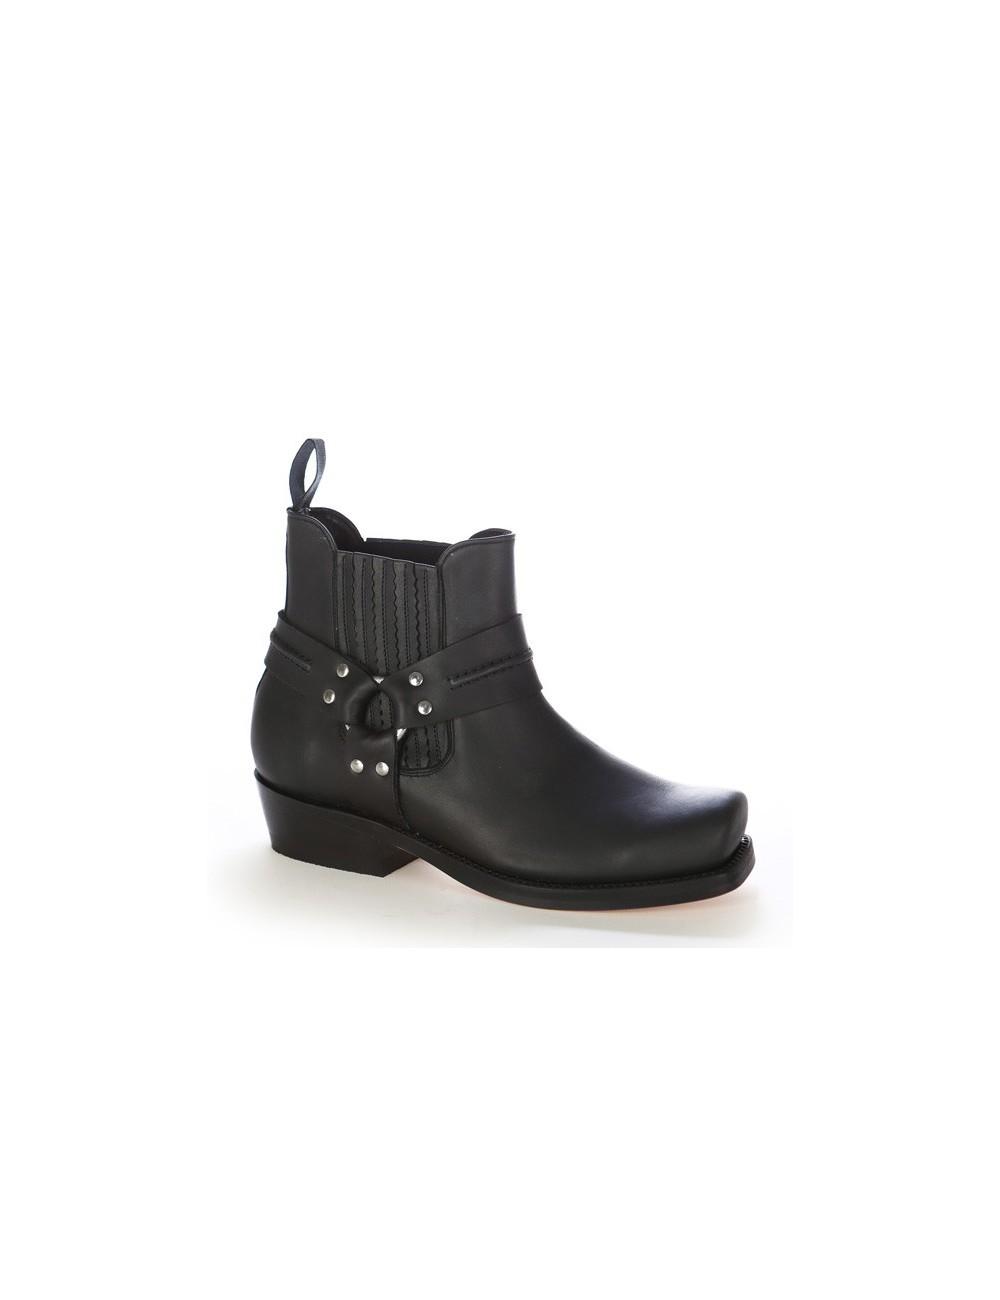 Boots western cuir noir bout carré - Boots motards